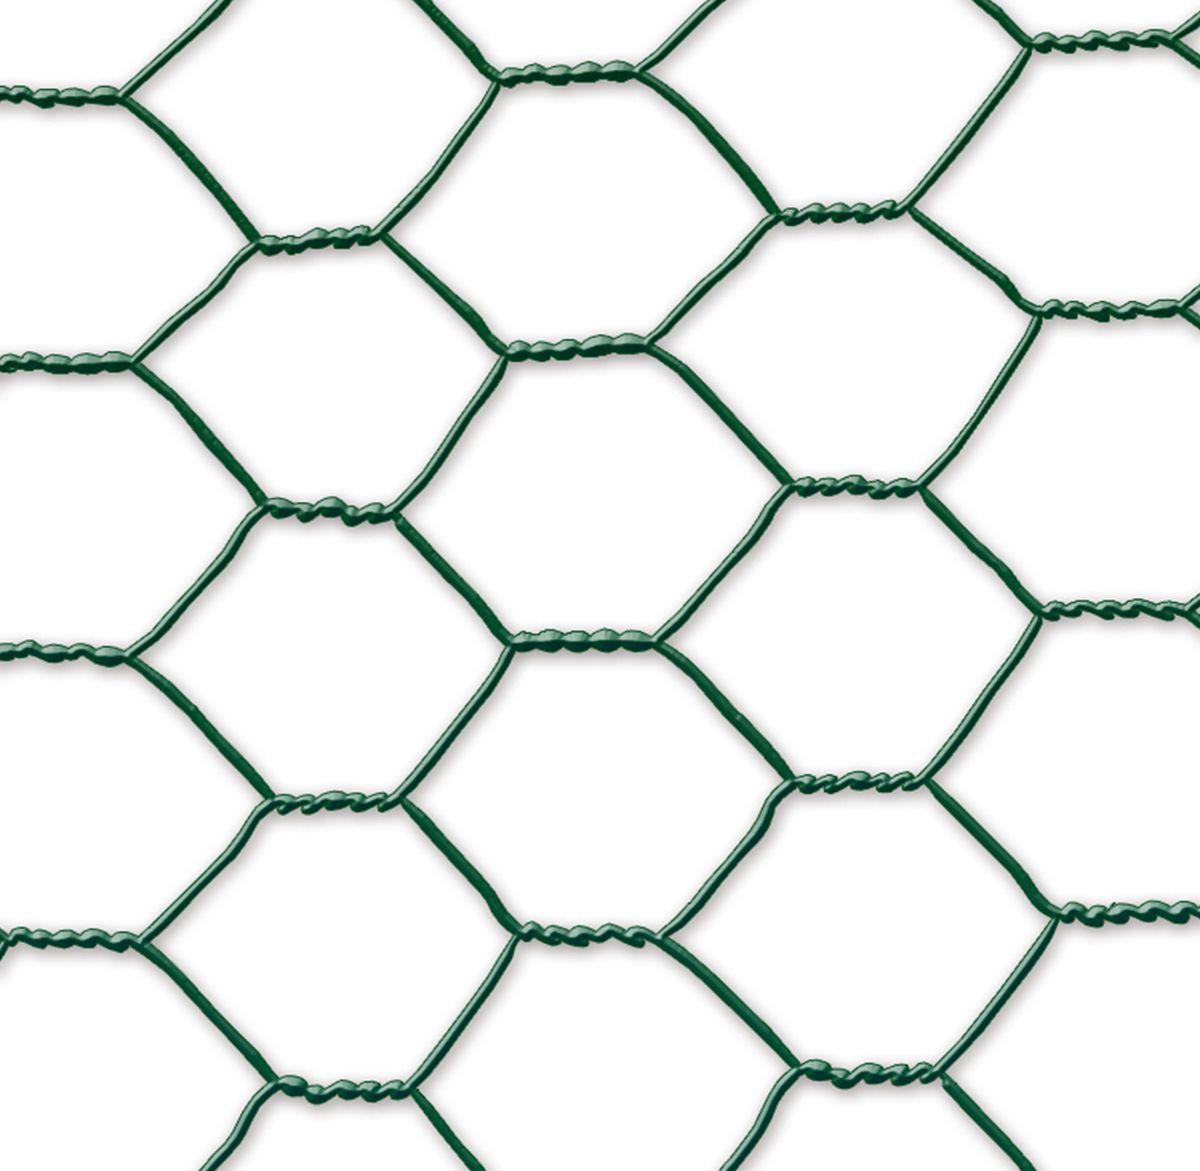 Grillage métal plastifié - 1 x 5 m/13 x 0,7 mm \